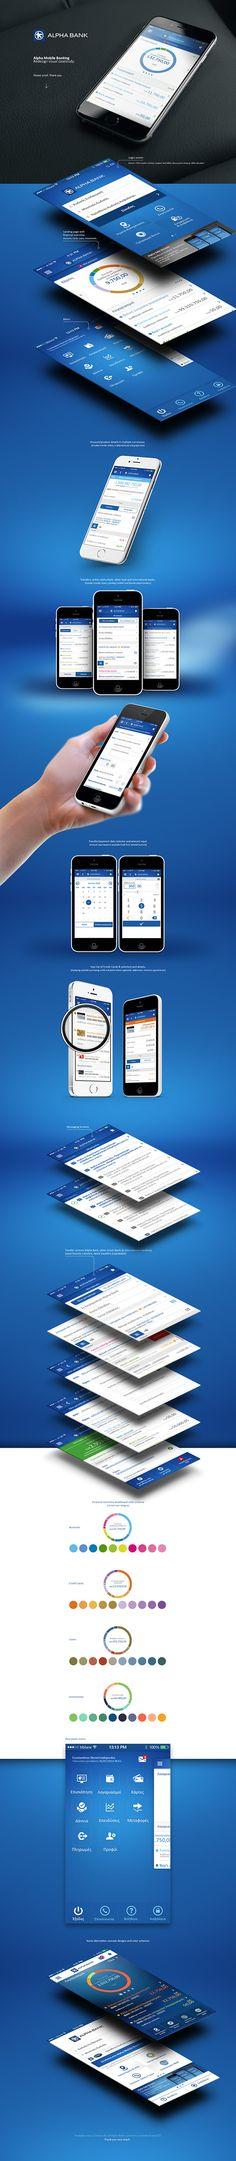 Alpha Mobile Banking.